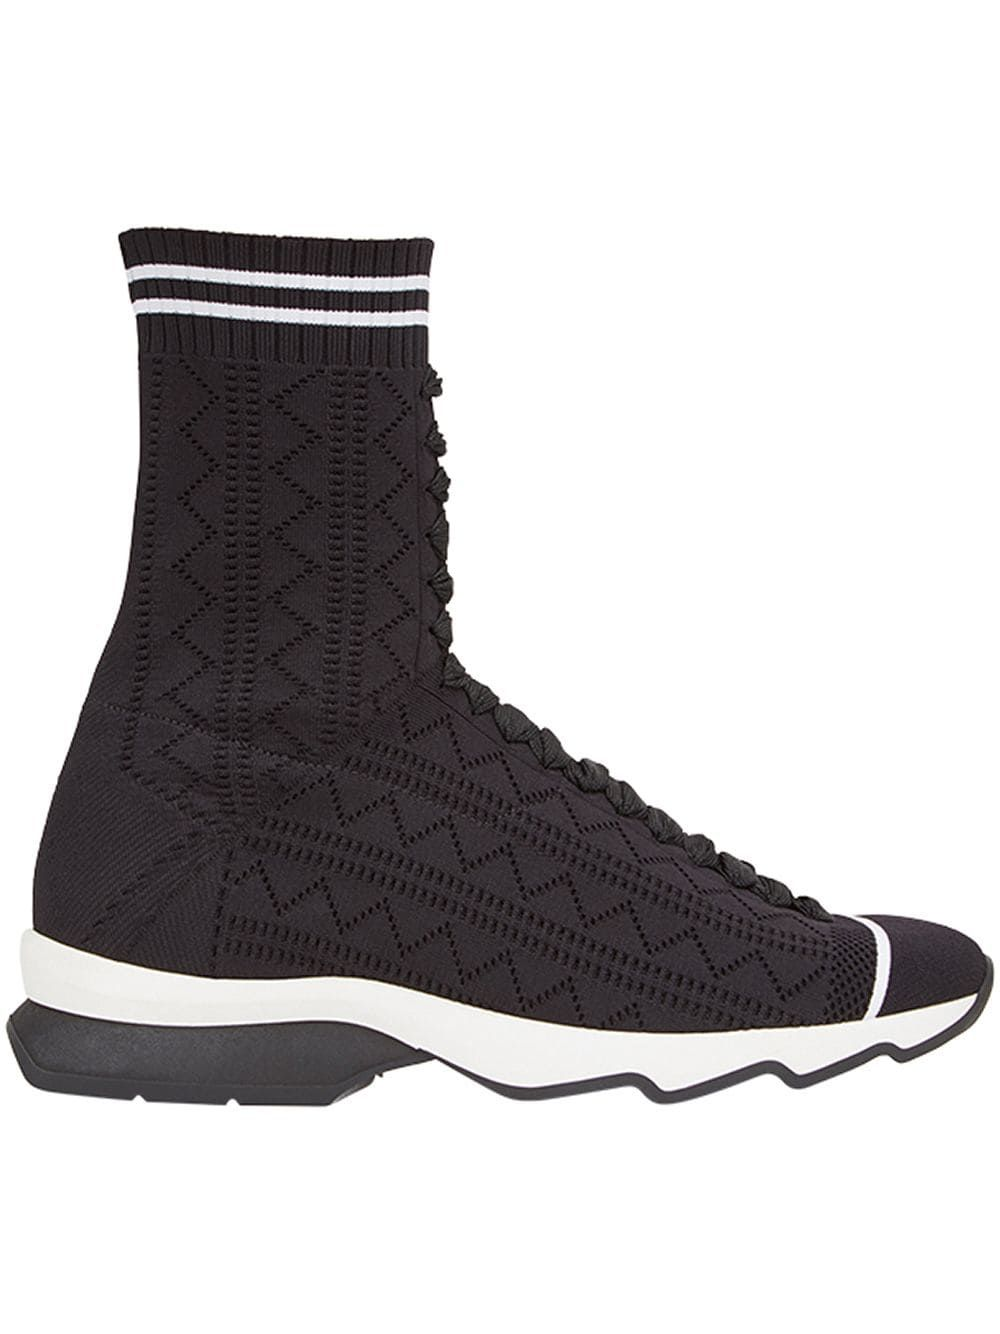 984ba636c3 Fendi open work sneakers - Black in 2019 | Products | Work sneakers ...